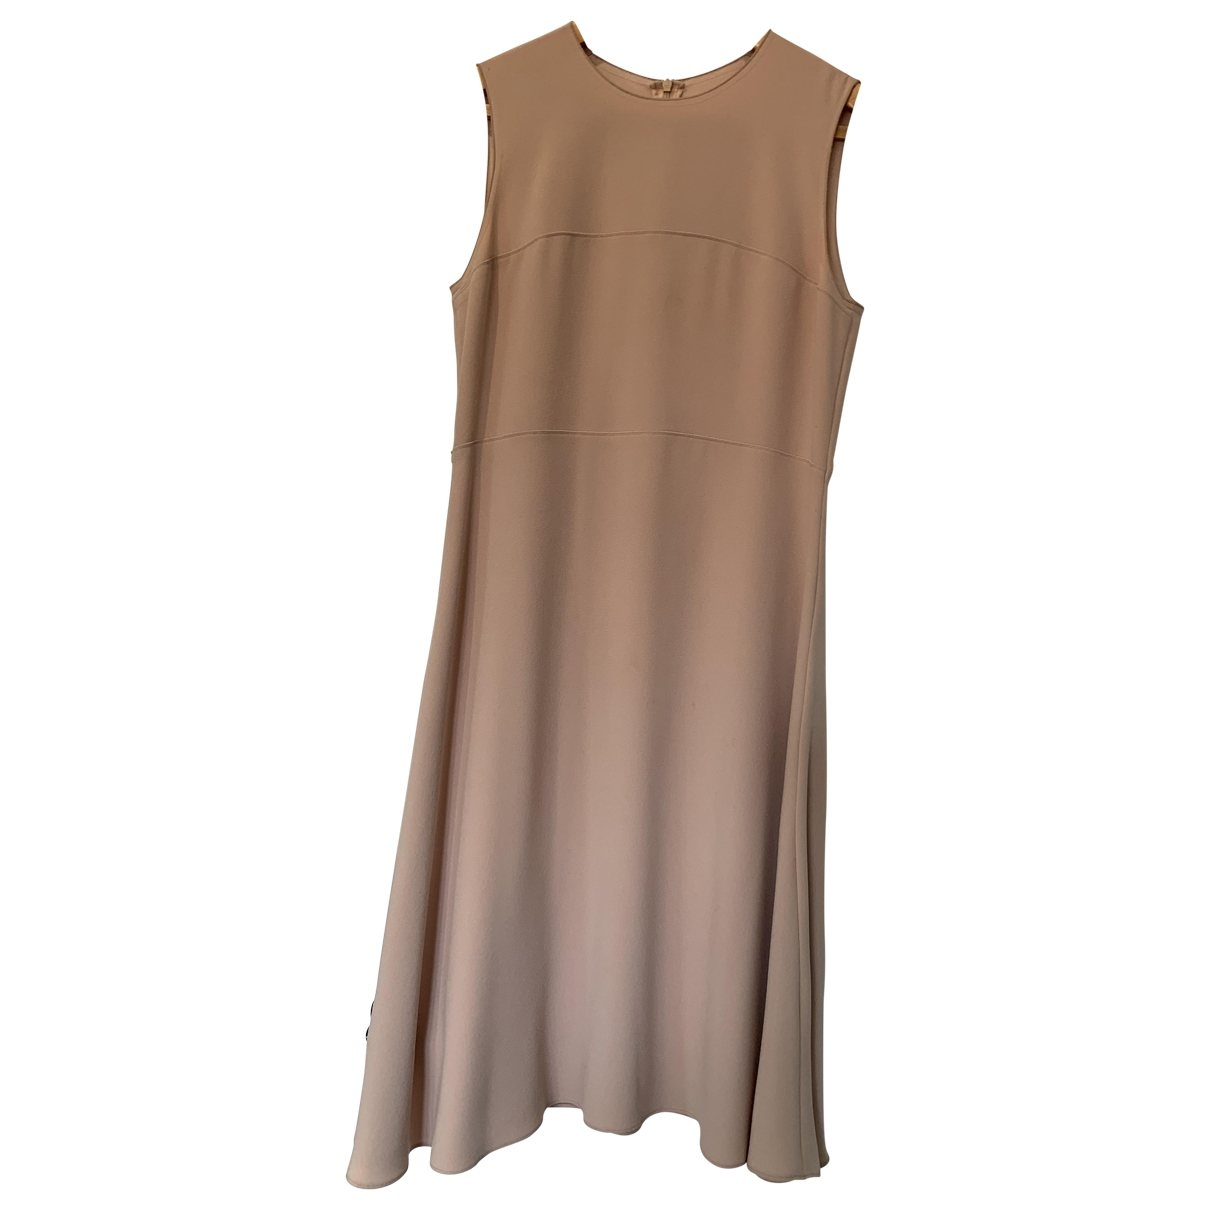 Joseph \N Ecru dress for Women 38 FR